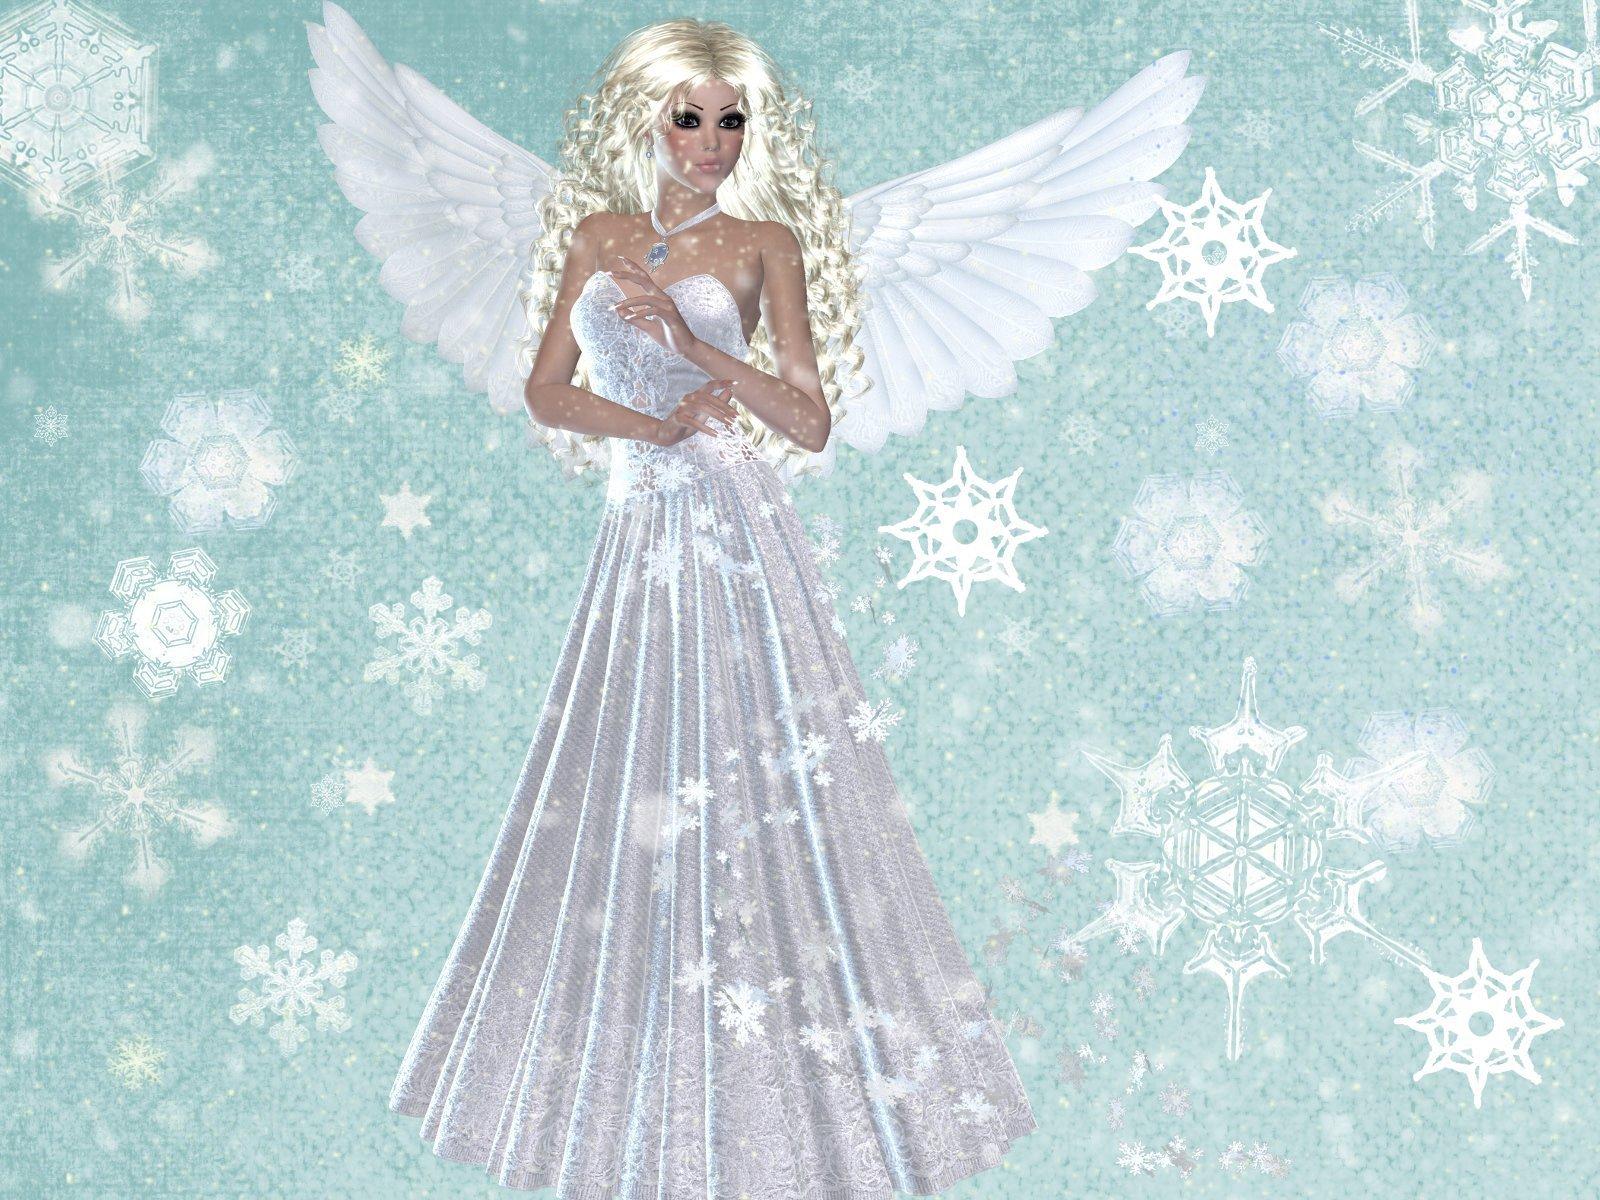 Angel Wallpaper   Angels Wallpaper 9902163 1600x1200